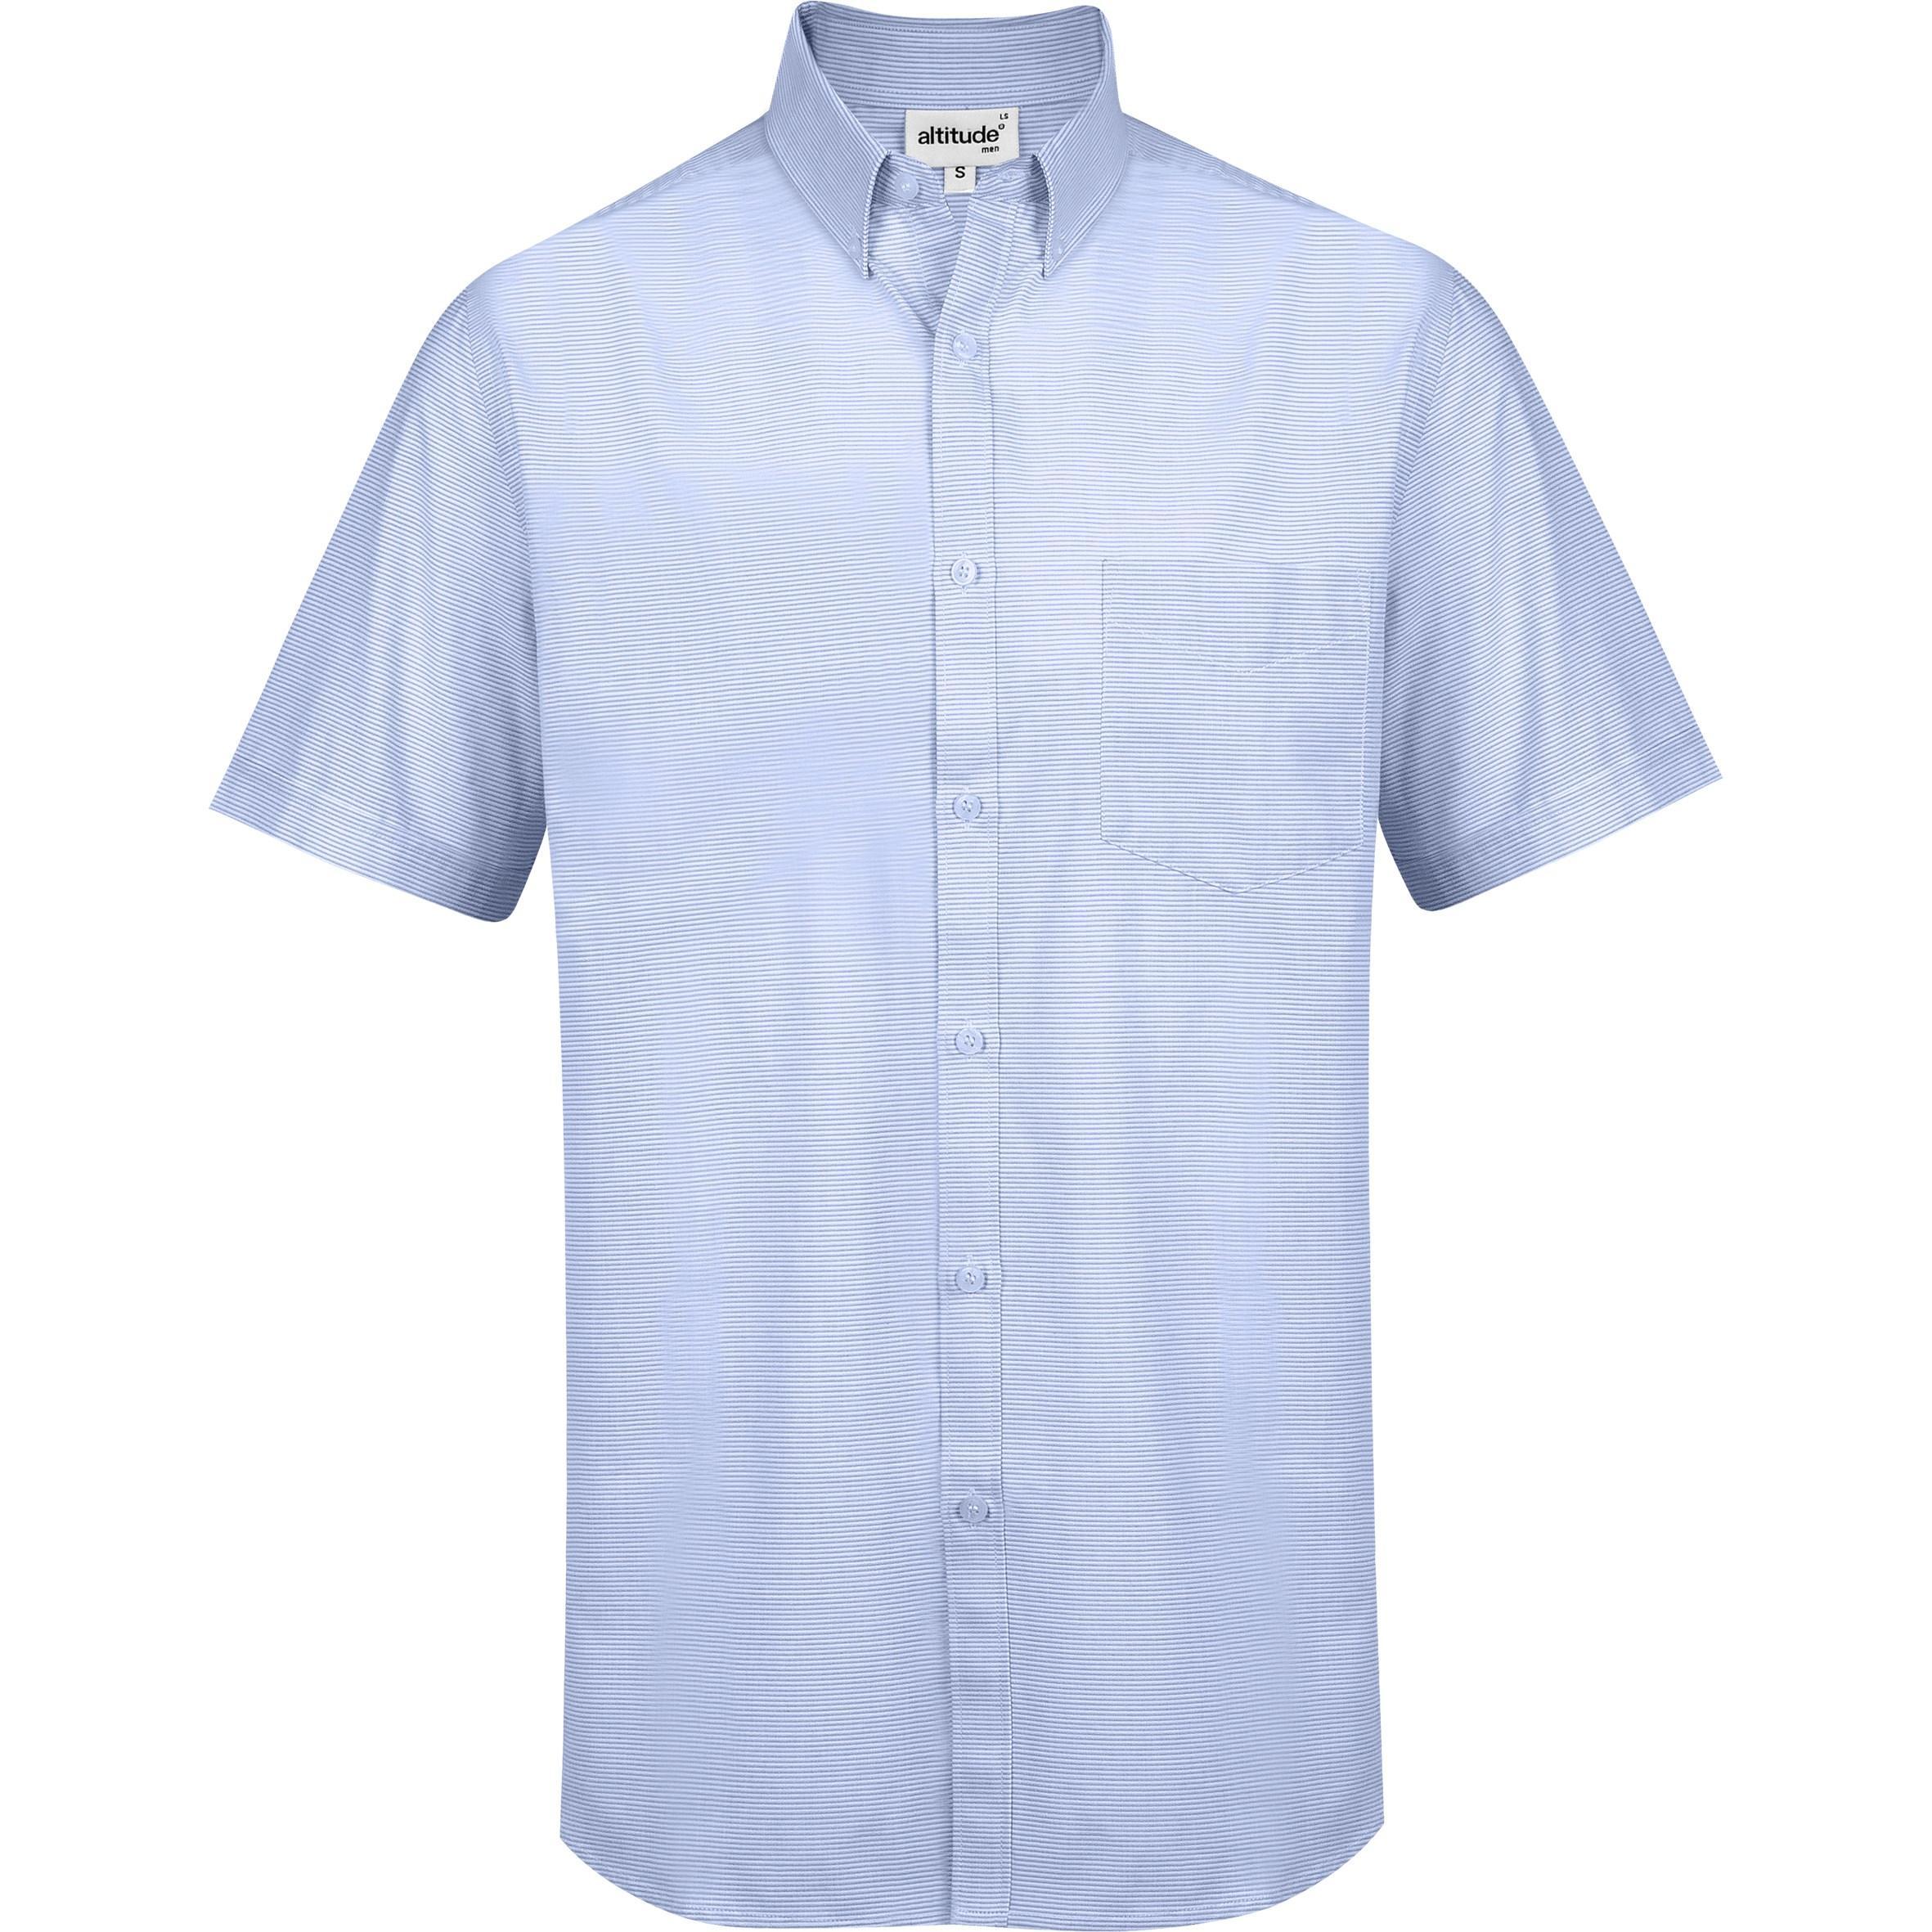 Mens Short Sleeve Earl Shirt - Sky Blue Only